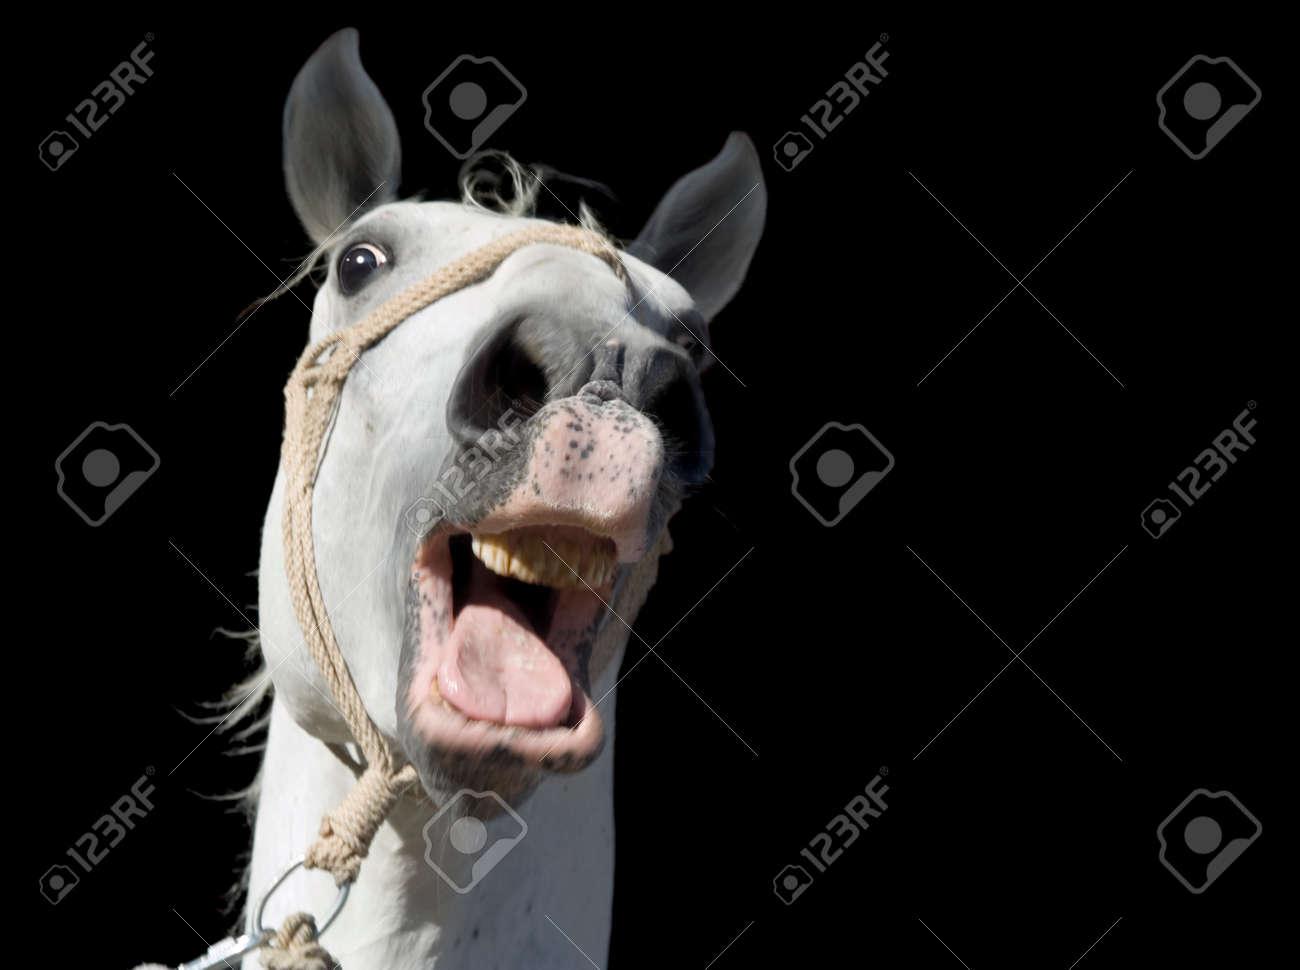 Frightened White Horse Isolated on Black Background Standard-Bild - 22980467